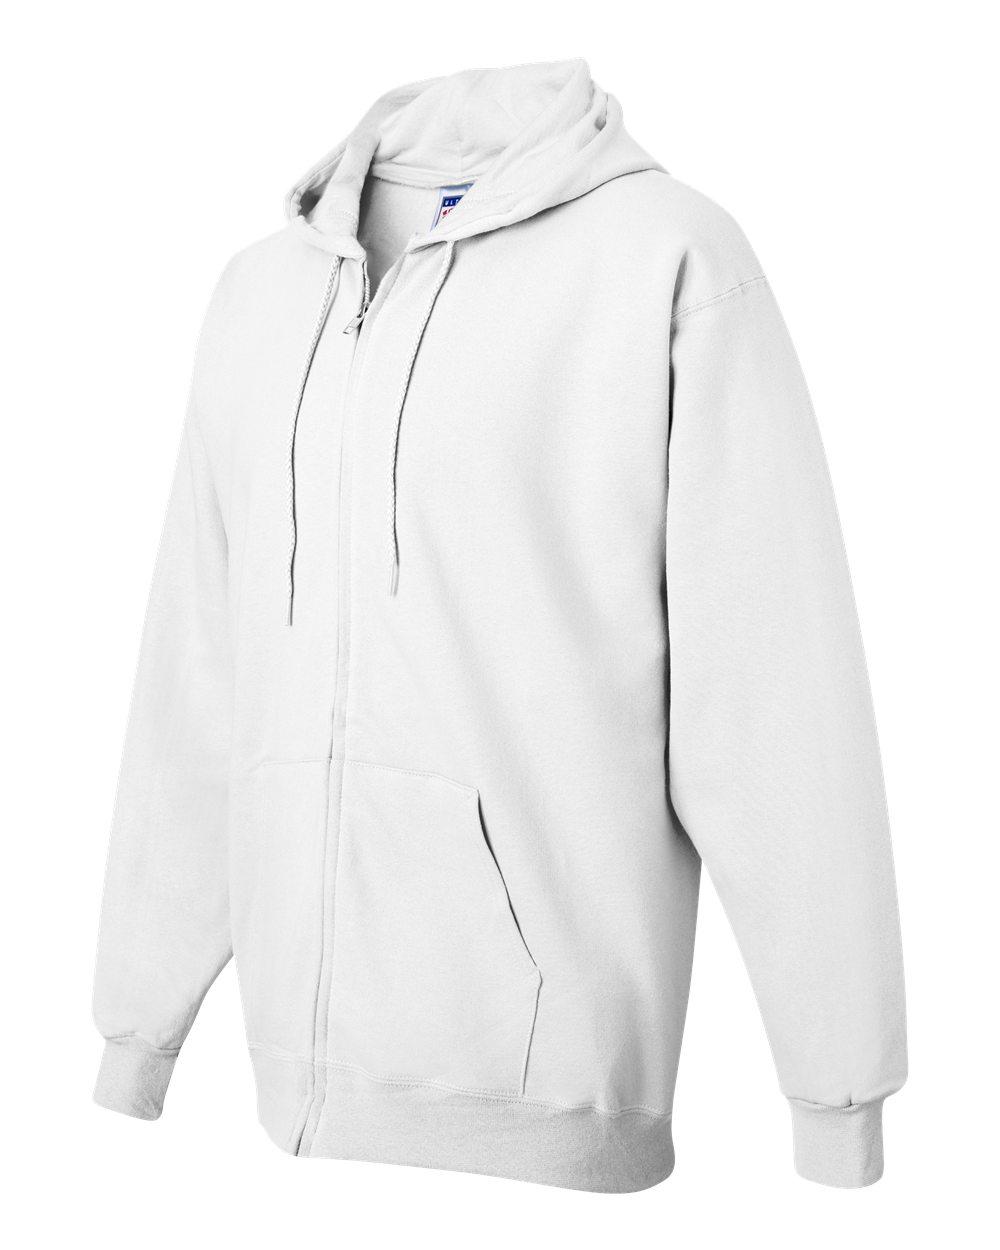 Hanes F280 - PrintProXP Ultimate Cotton Full-Zip Hooded Sweatshirt